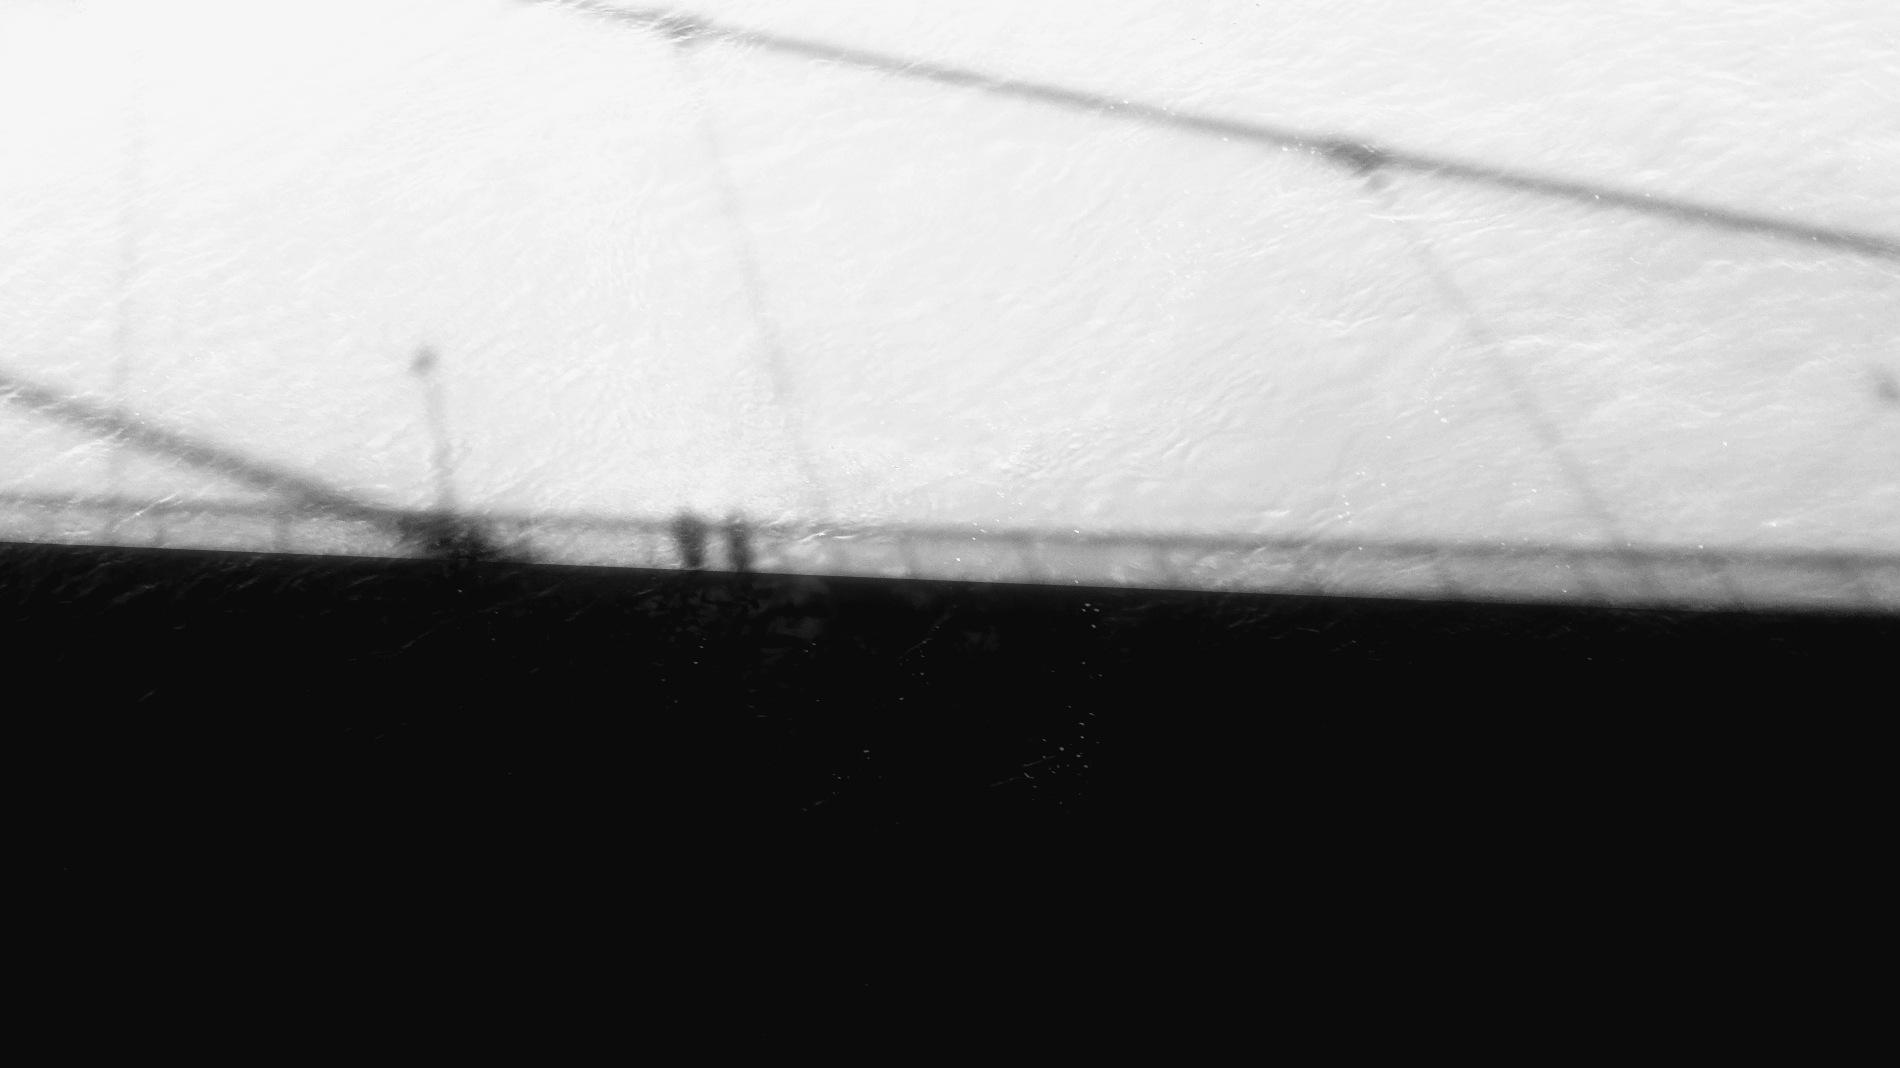 On the bridge by Gernot Schwarz